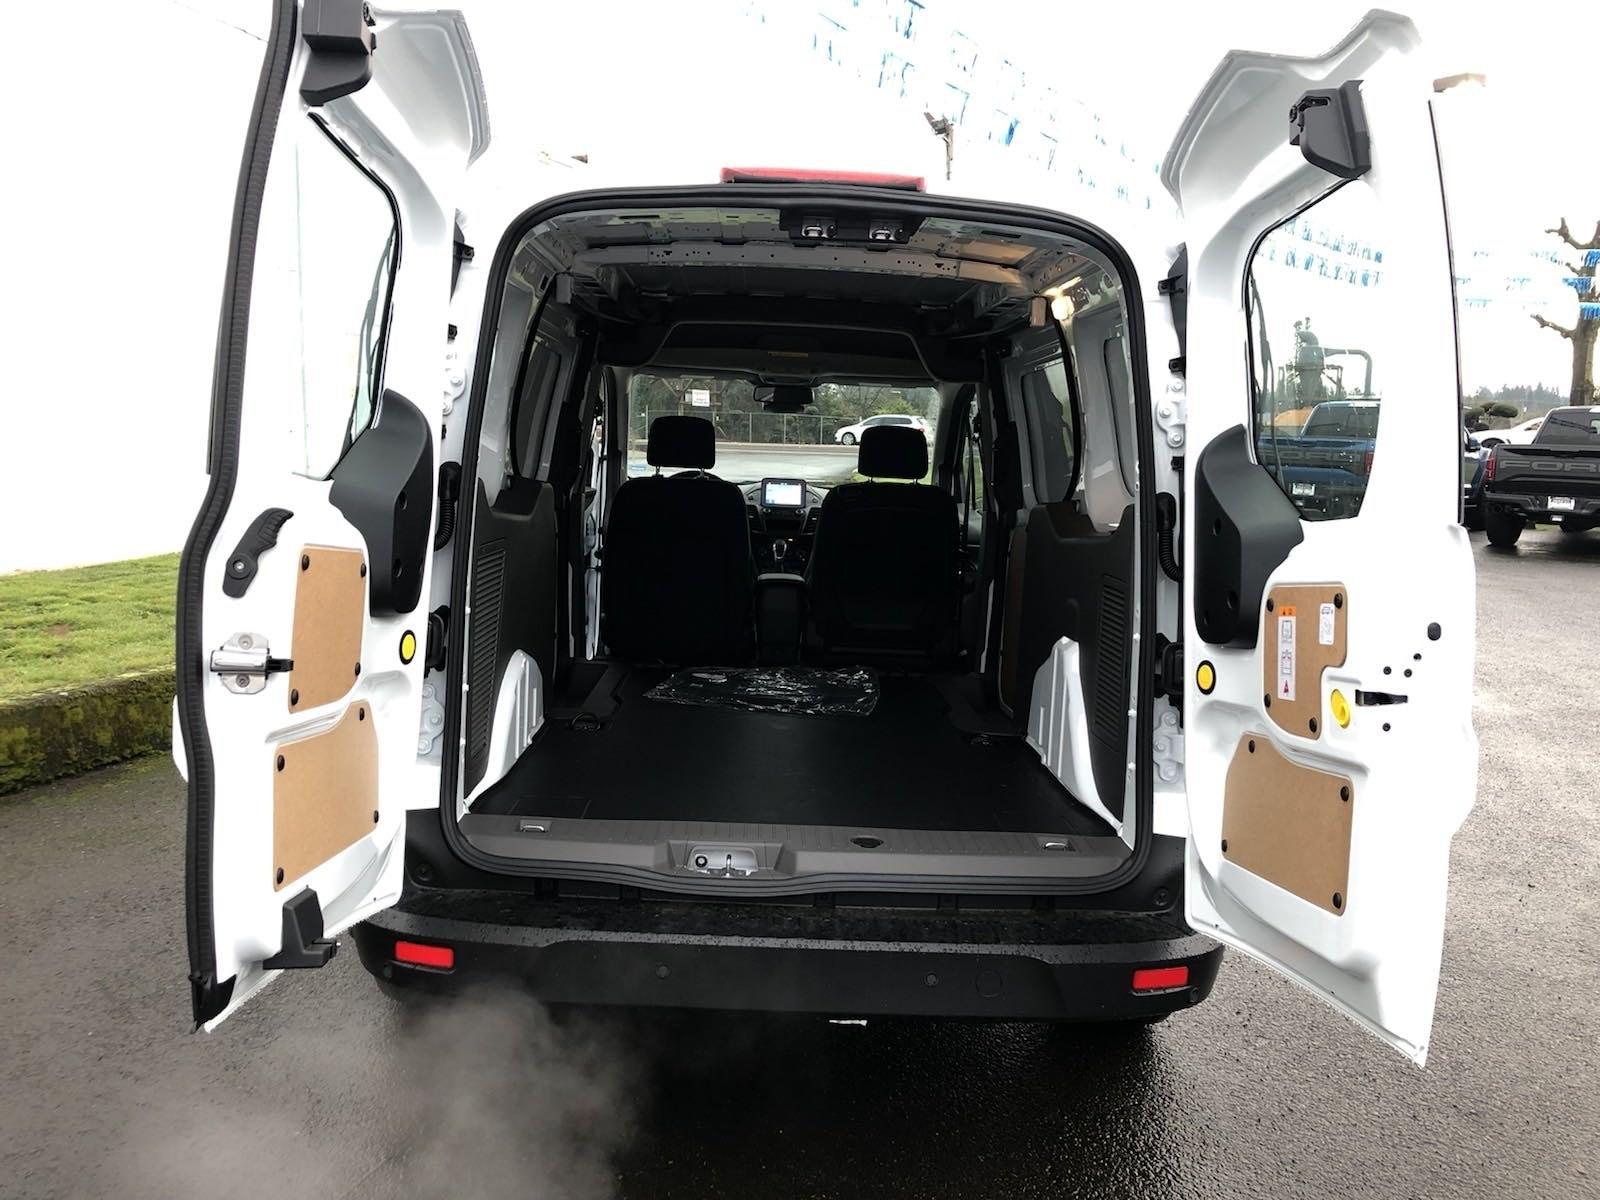 2020 Transit Connect, Empty Cargo Van #208517 - photo 1